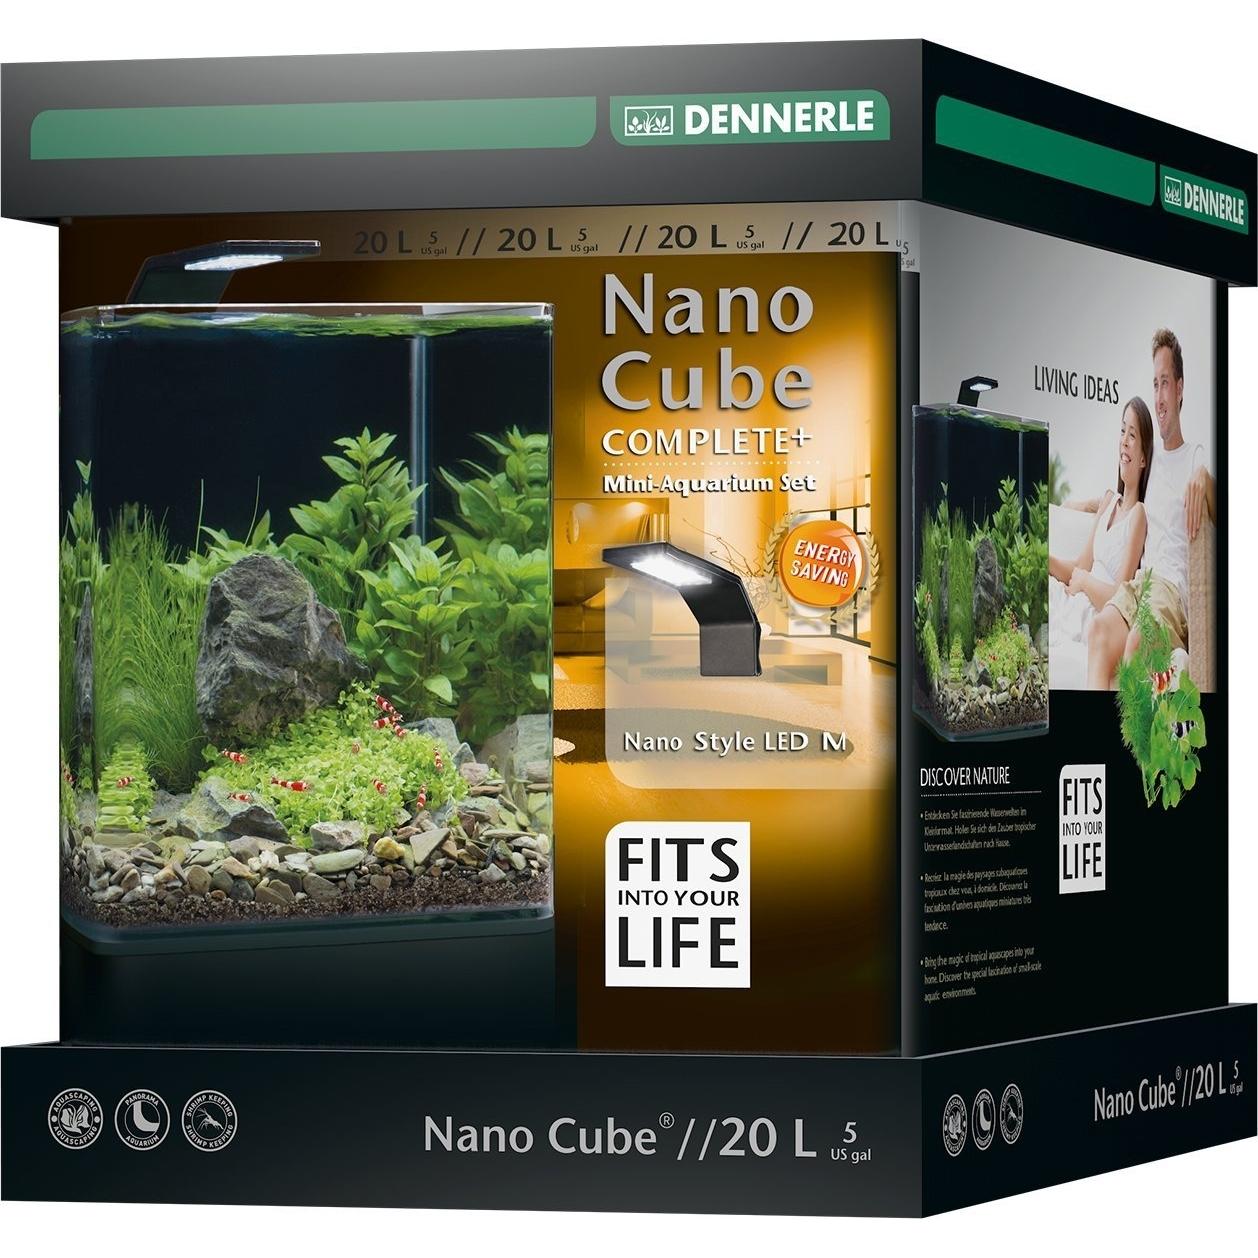 Dennerle NanoCube Complete+ Style LED Bild 5